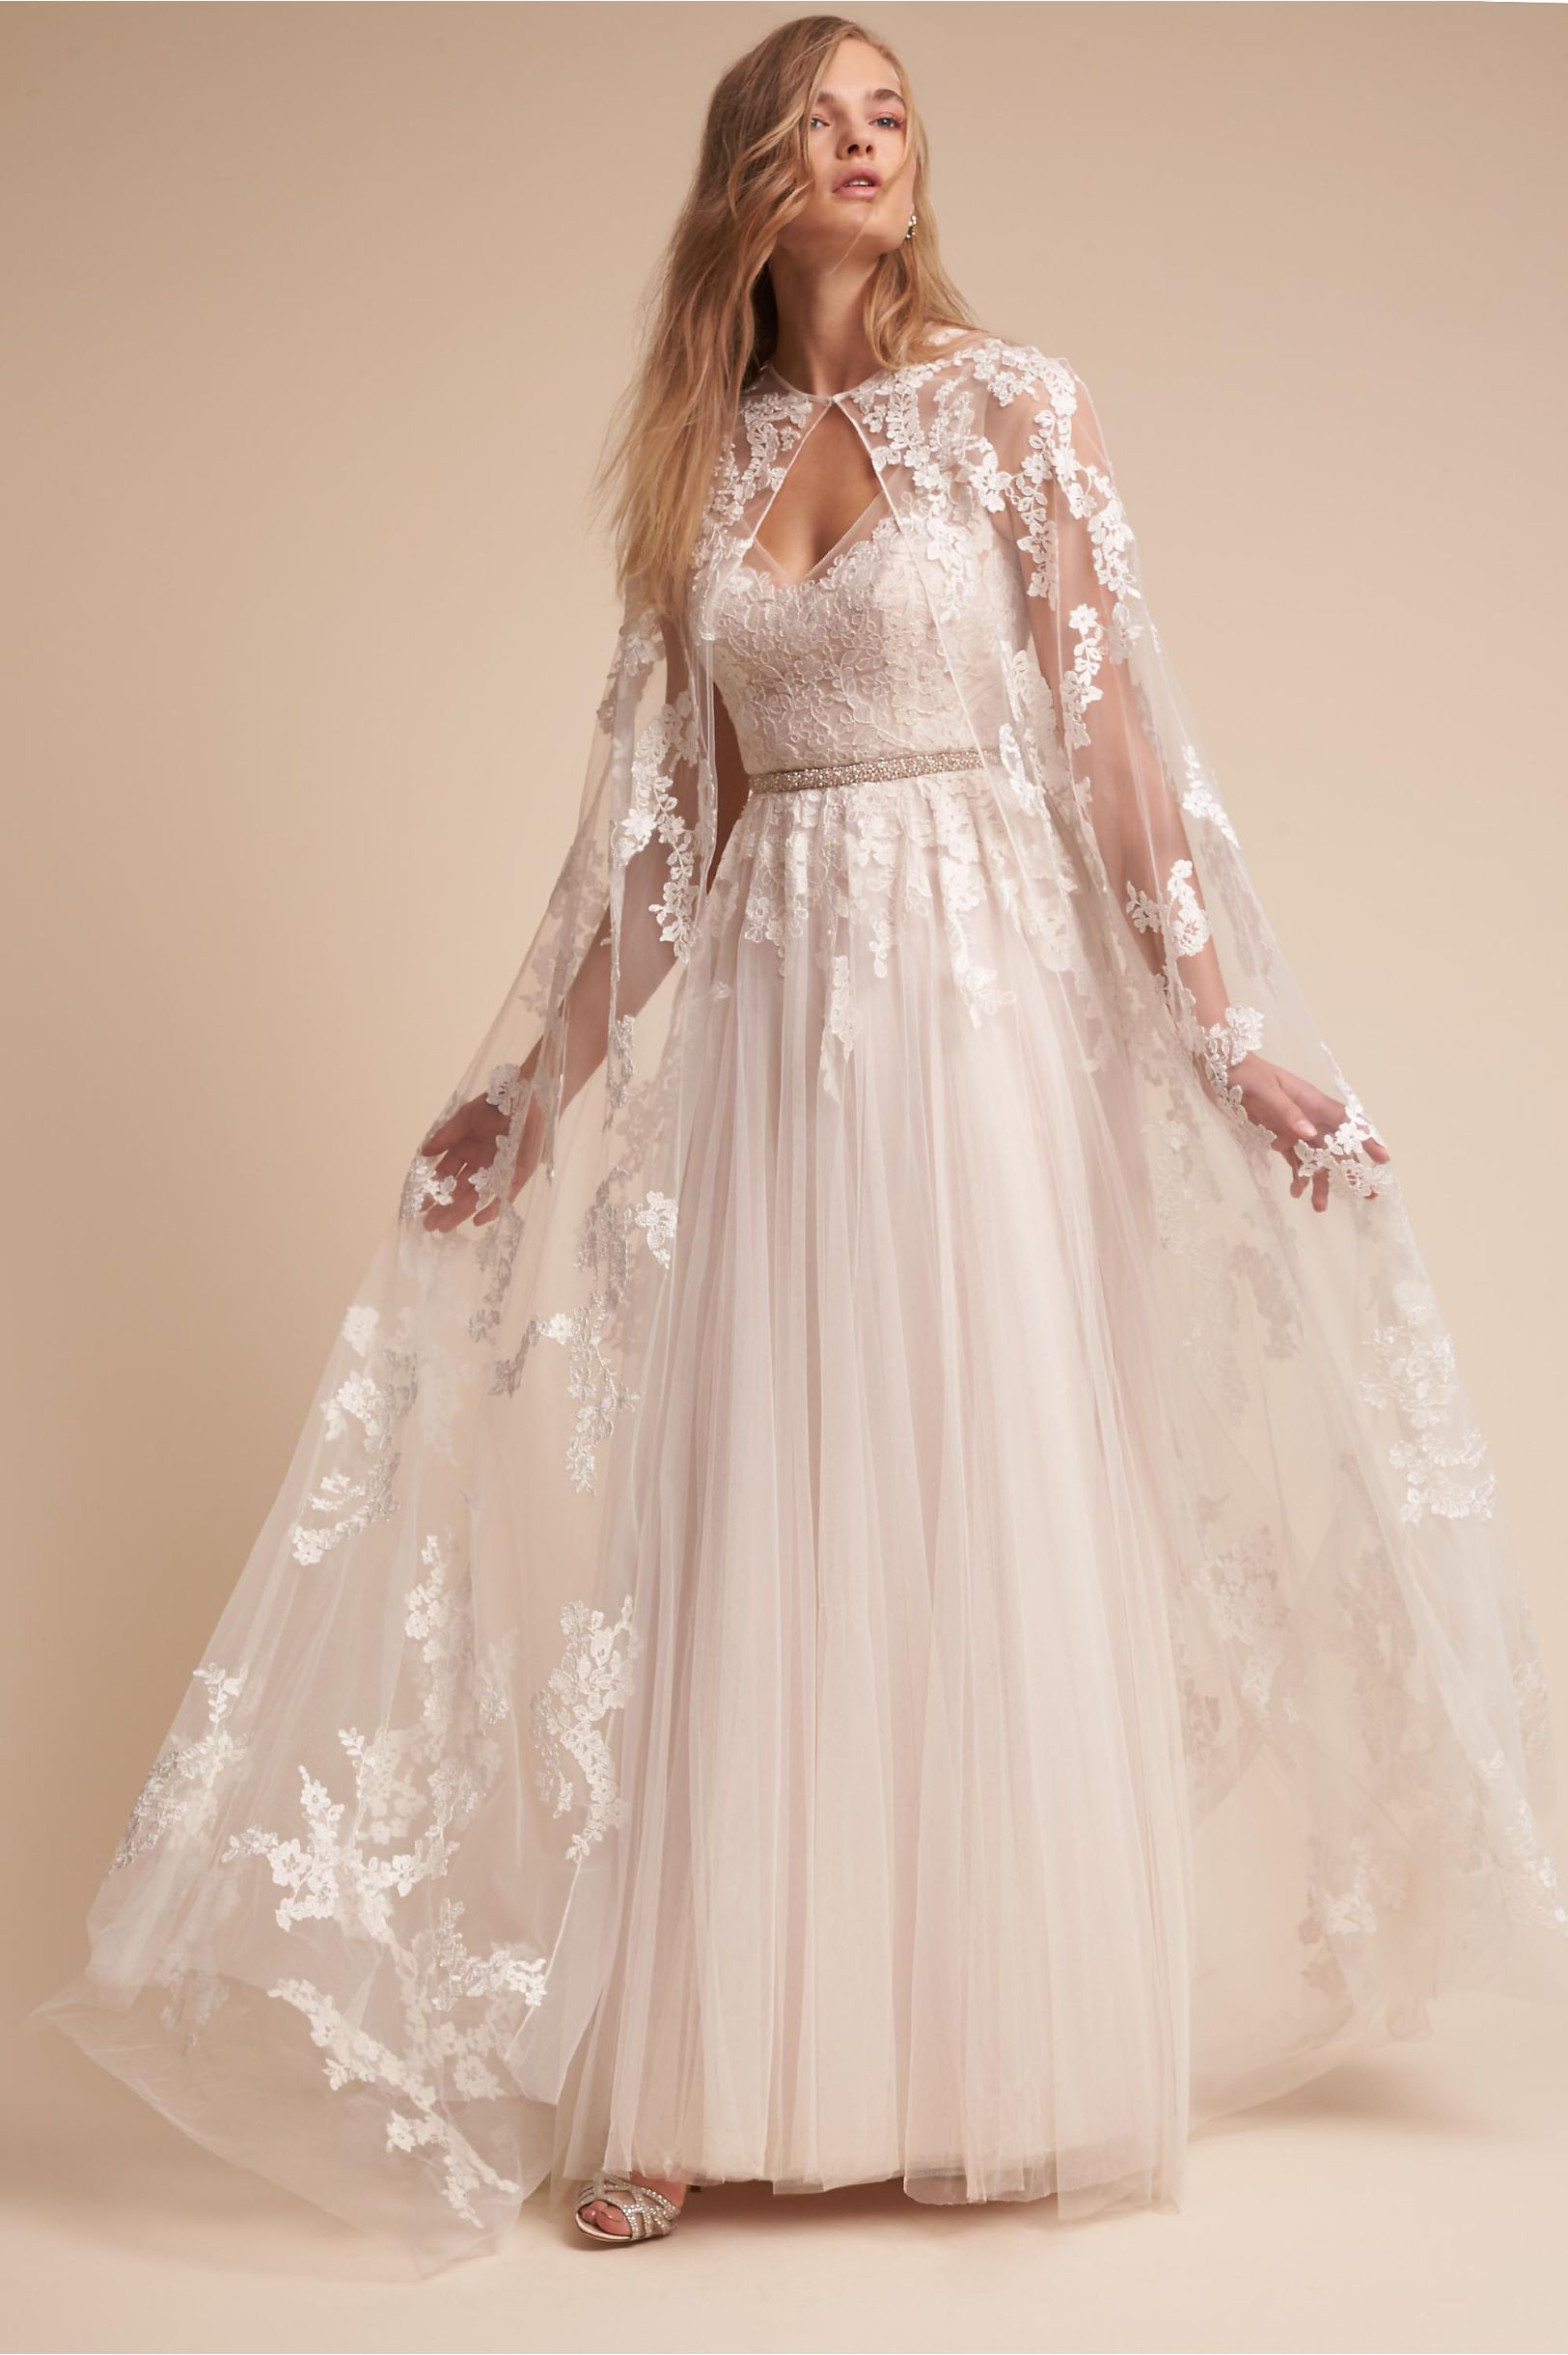 Eddy K Anastasia Cape Wedding Dresses Bridal Cape Lace Weddings